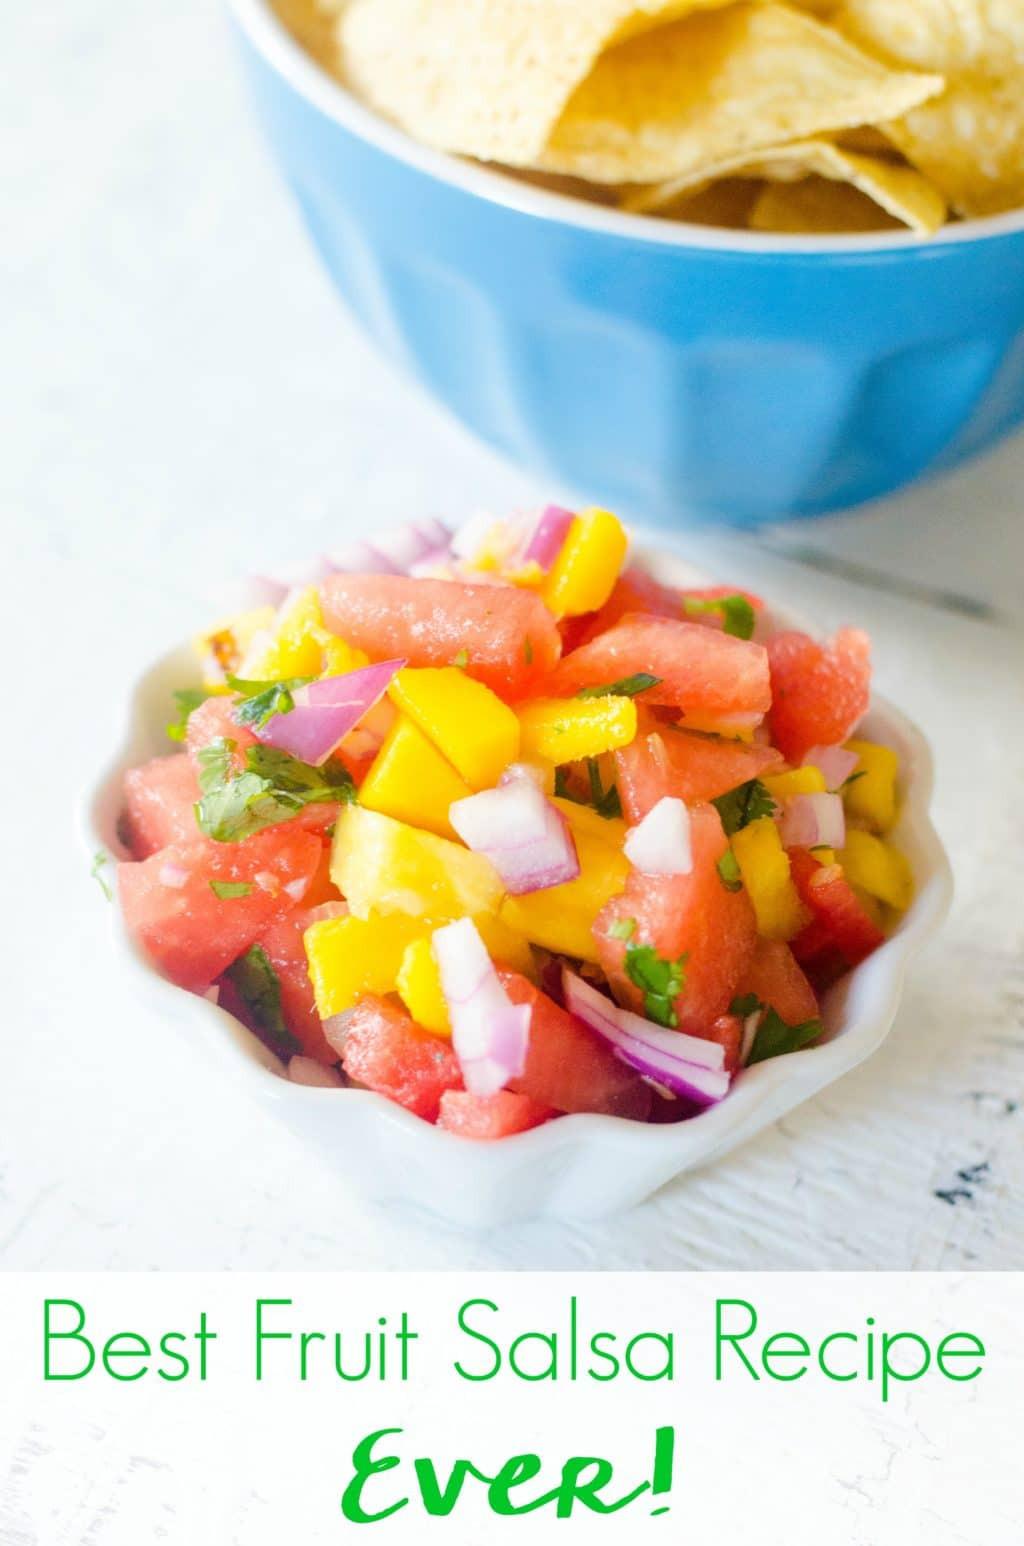 Fruit Salsa Recipe  The Best Fruit Salsa Recipe Ever Tropical Fruit Salsa